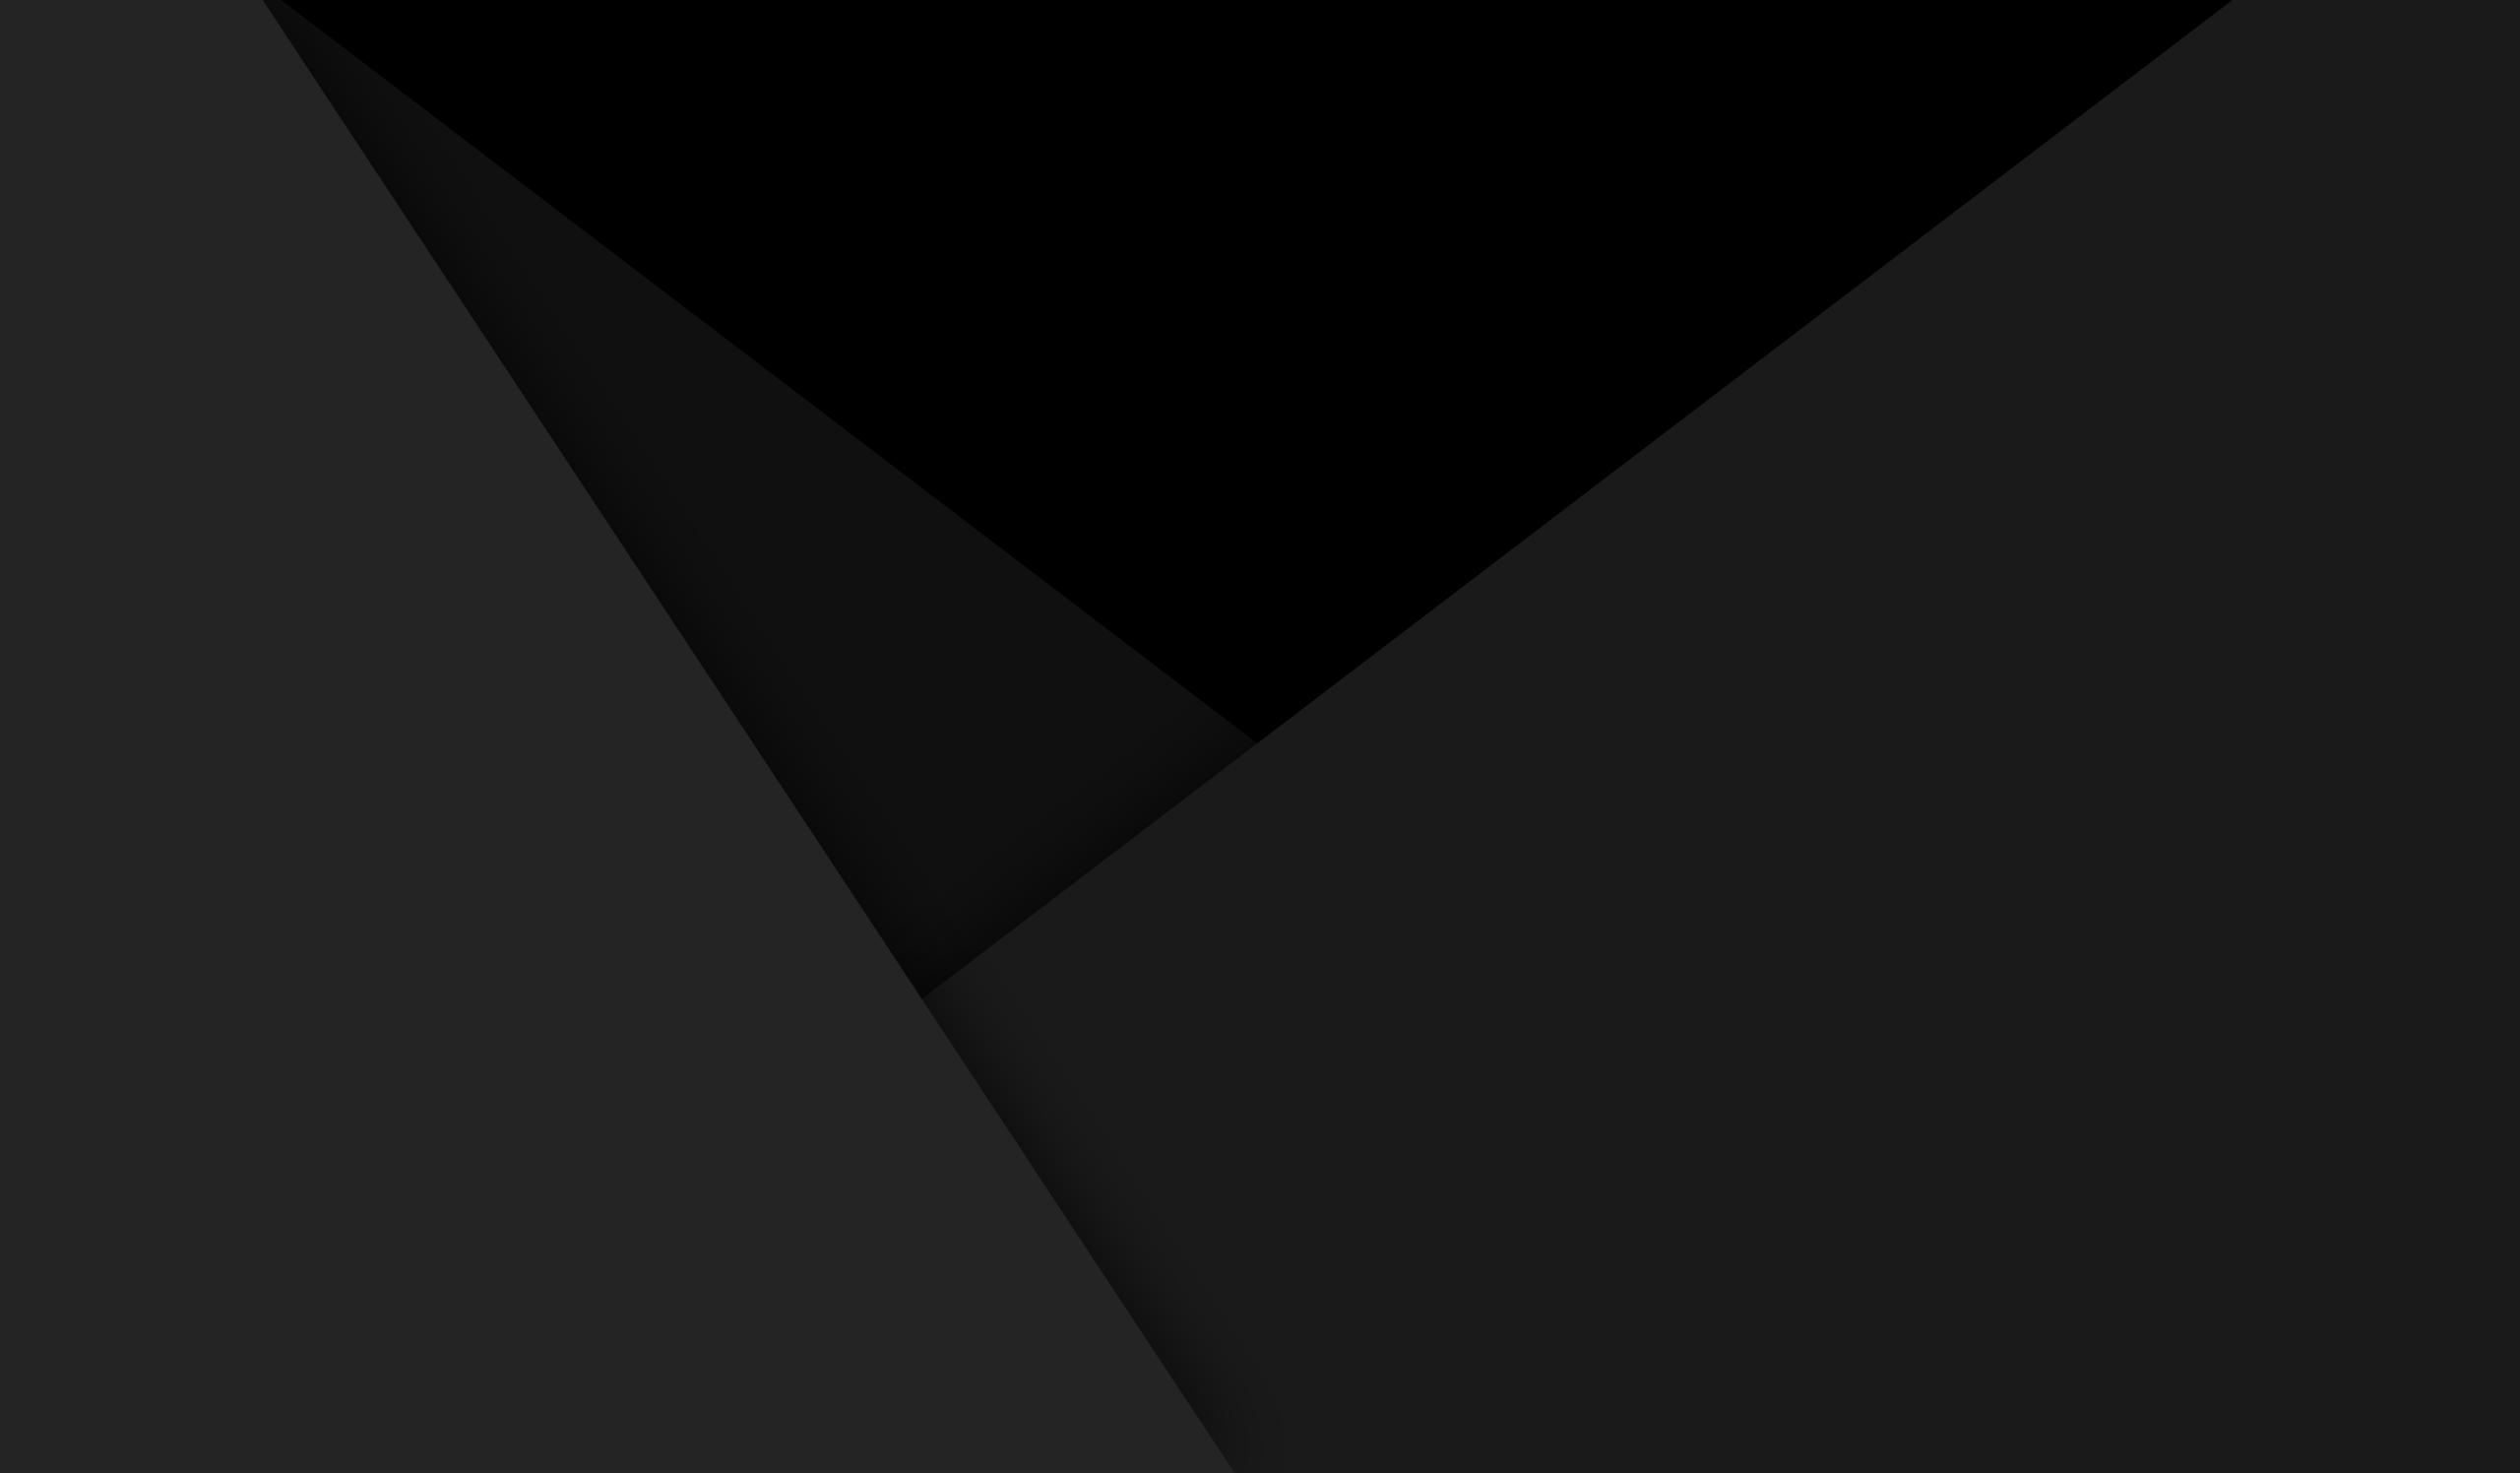 google chrome backgrounds google search platform ux general